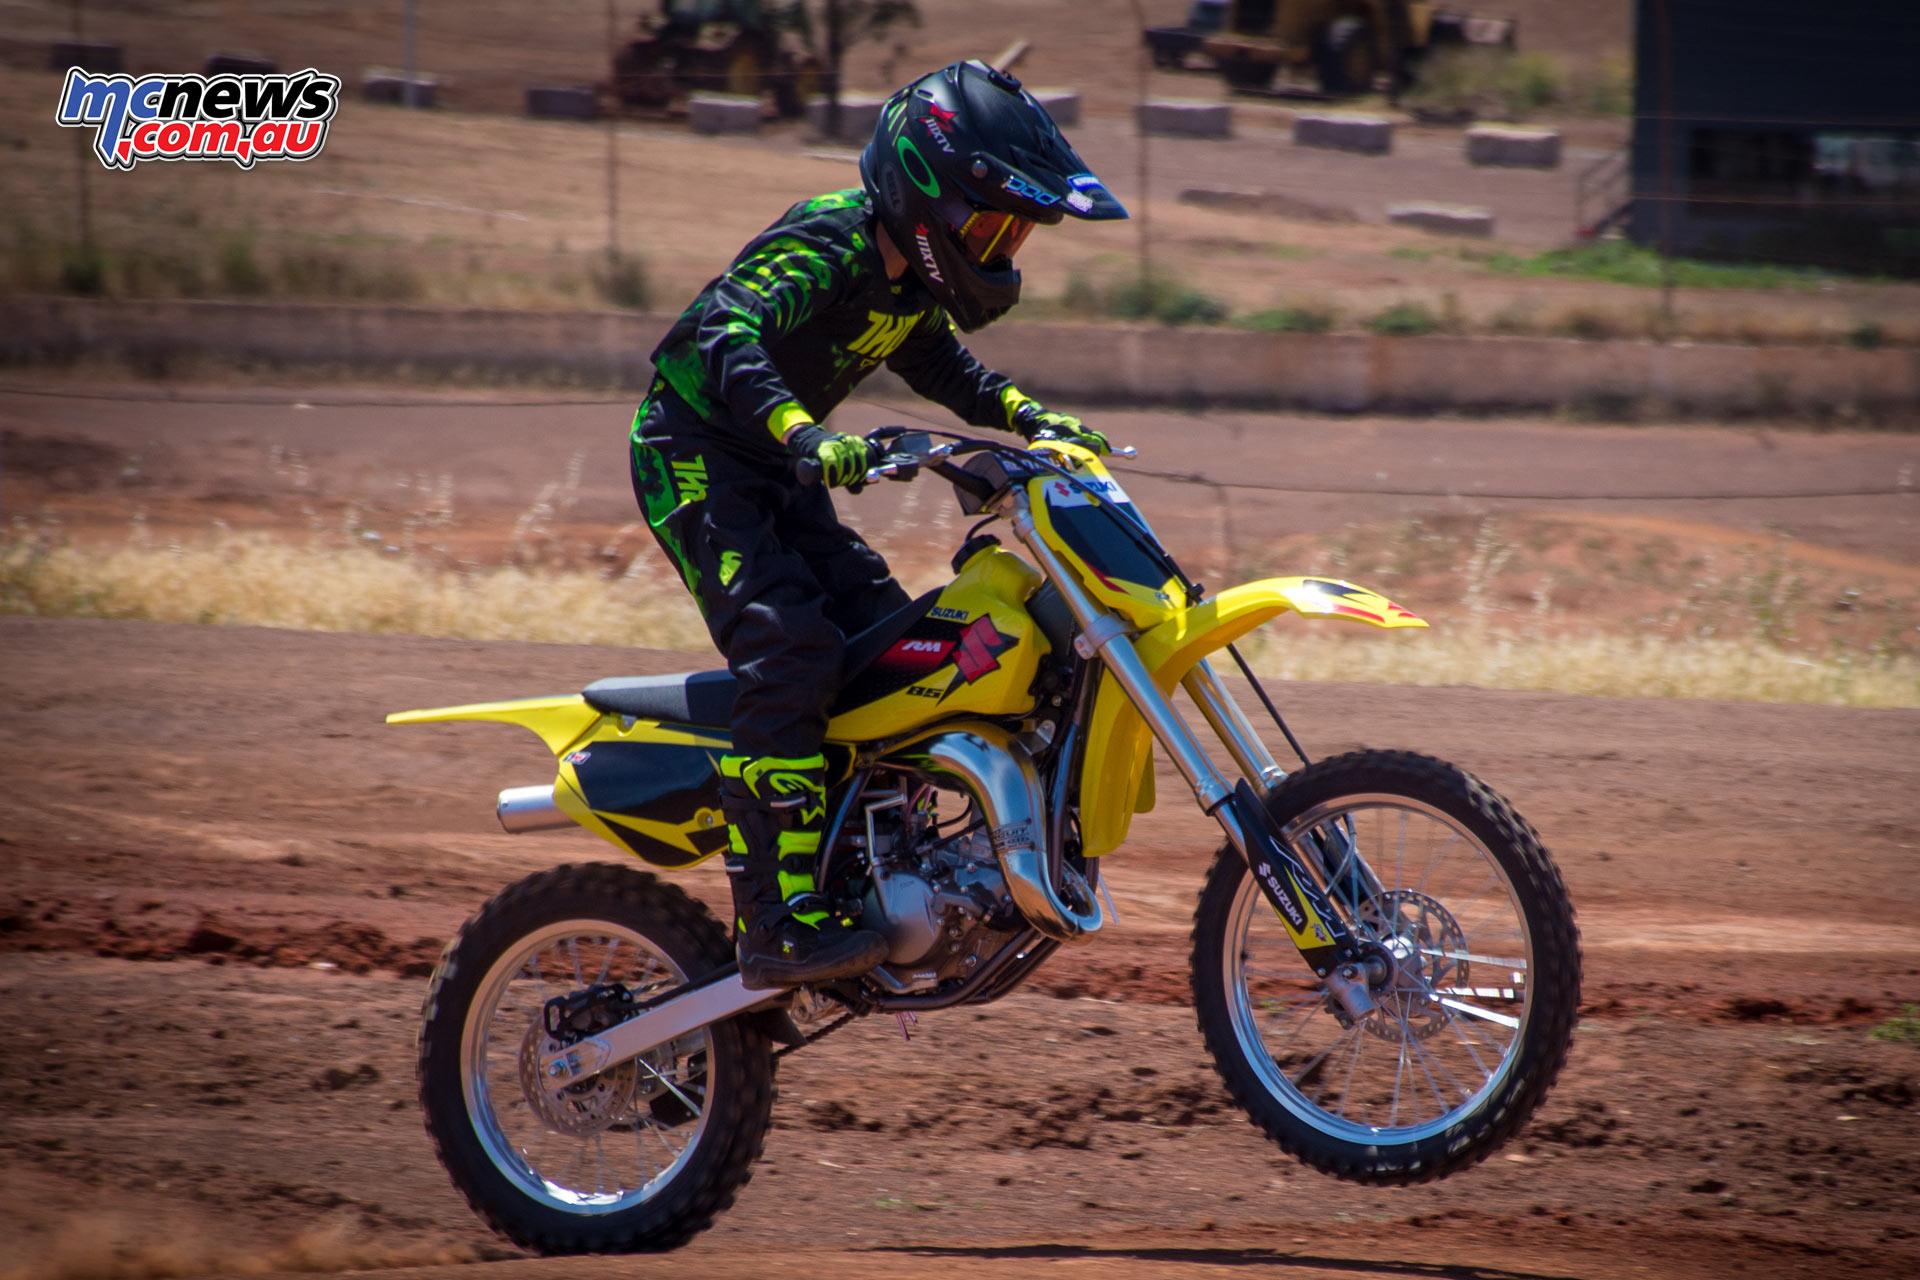 Suzuki Update Rm85 Bonus Race Kit Mcnews Com Au